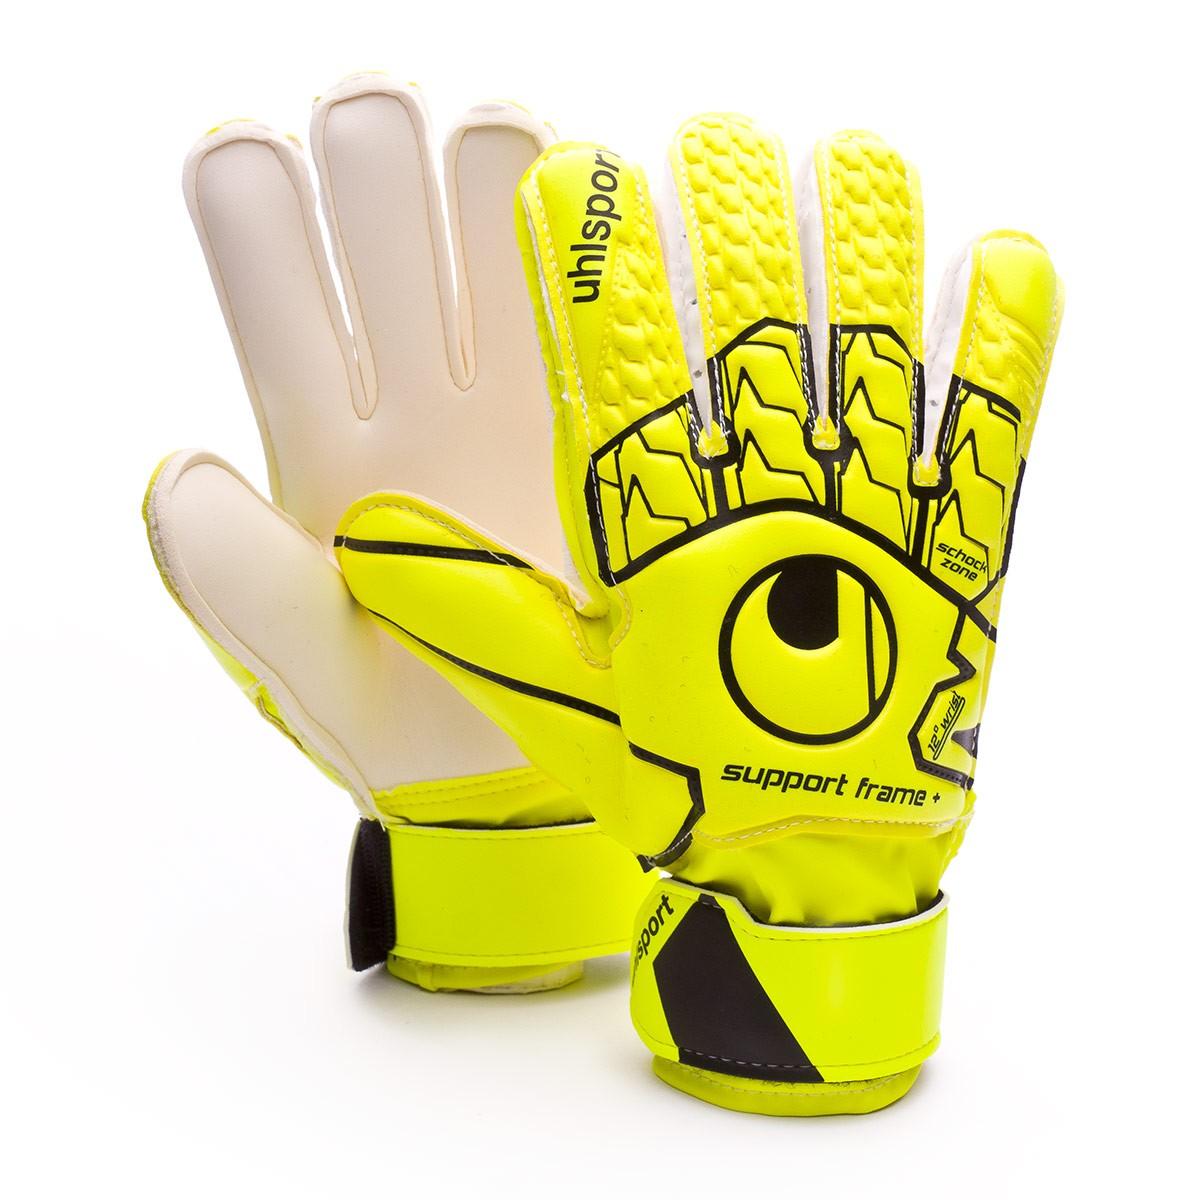 dfdb3bc4761 Guante de portero Uhlsport Soft SF+ Niño Fluor yellow-Black - Tienda de  fútbol Fútbol Emotion